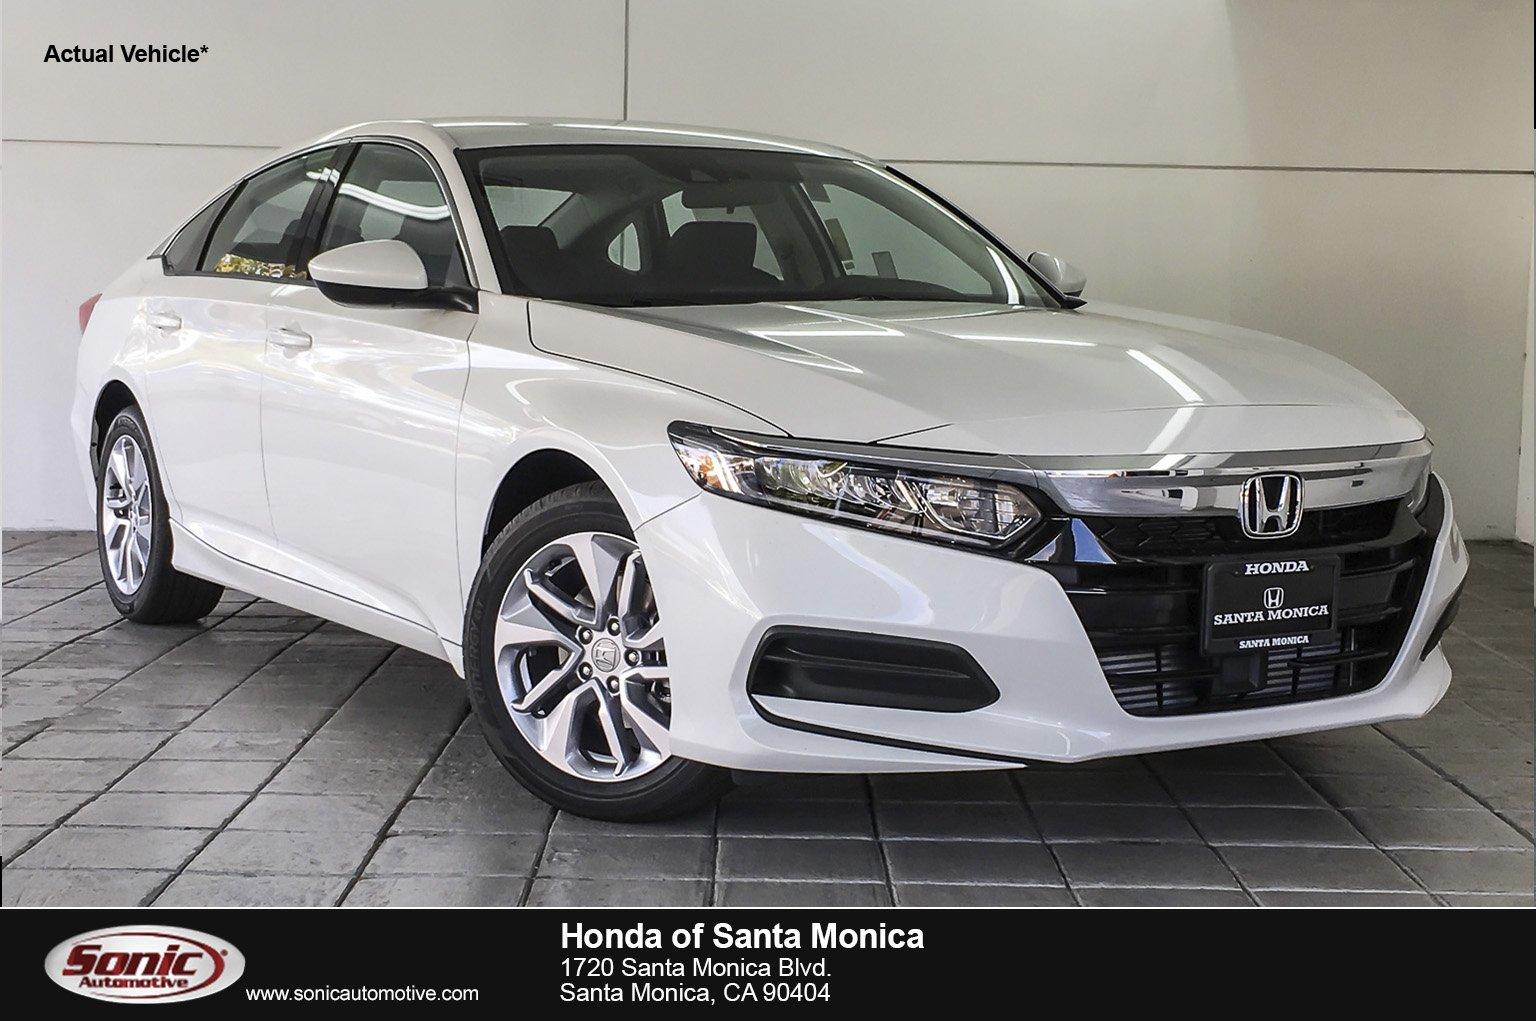 Honda Of Santa Monica >> New 2019 Honda Accord Lx For Sale In Santa Monica Ca Stock Ka084559